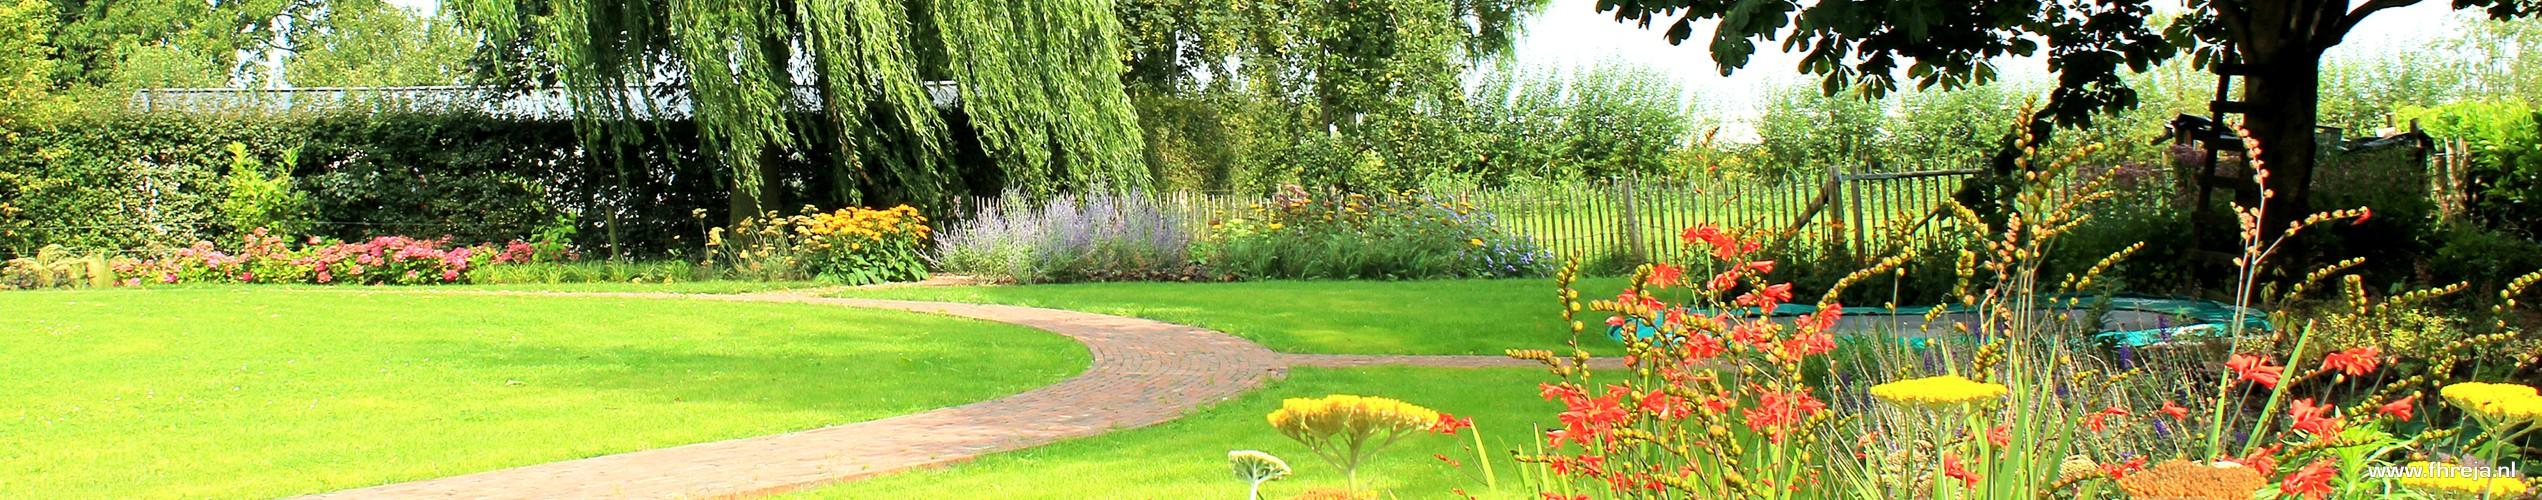 Royale kleurige tuin - Fhreja - Ontwerpbureau Groene Ruimte